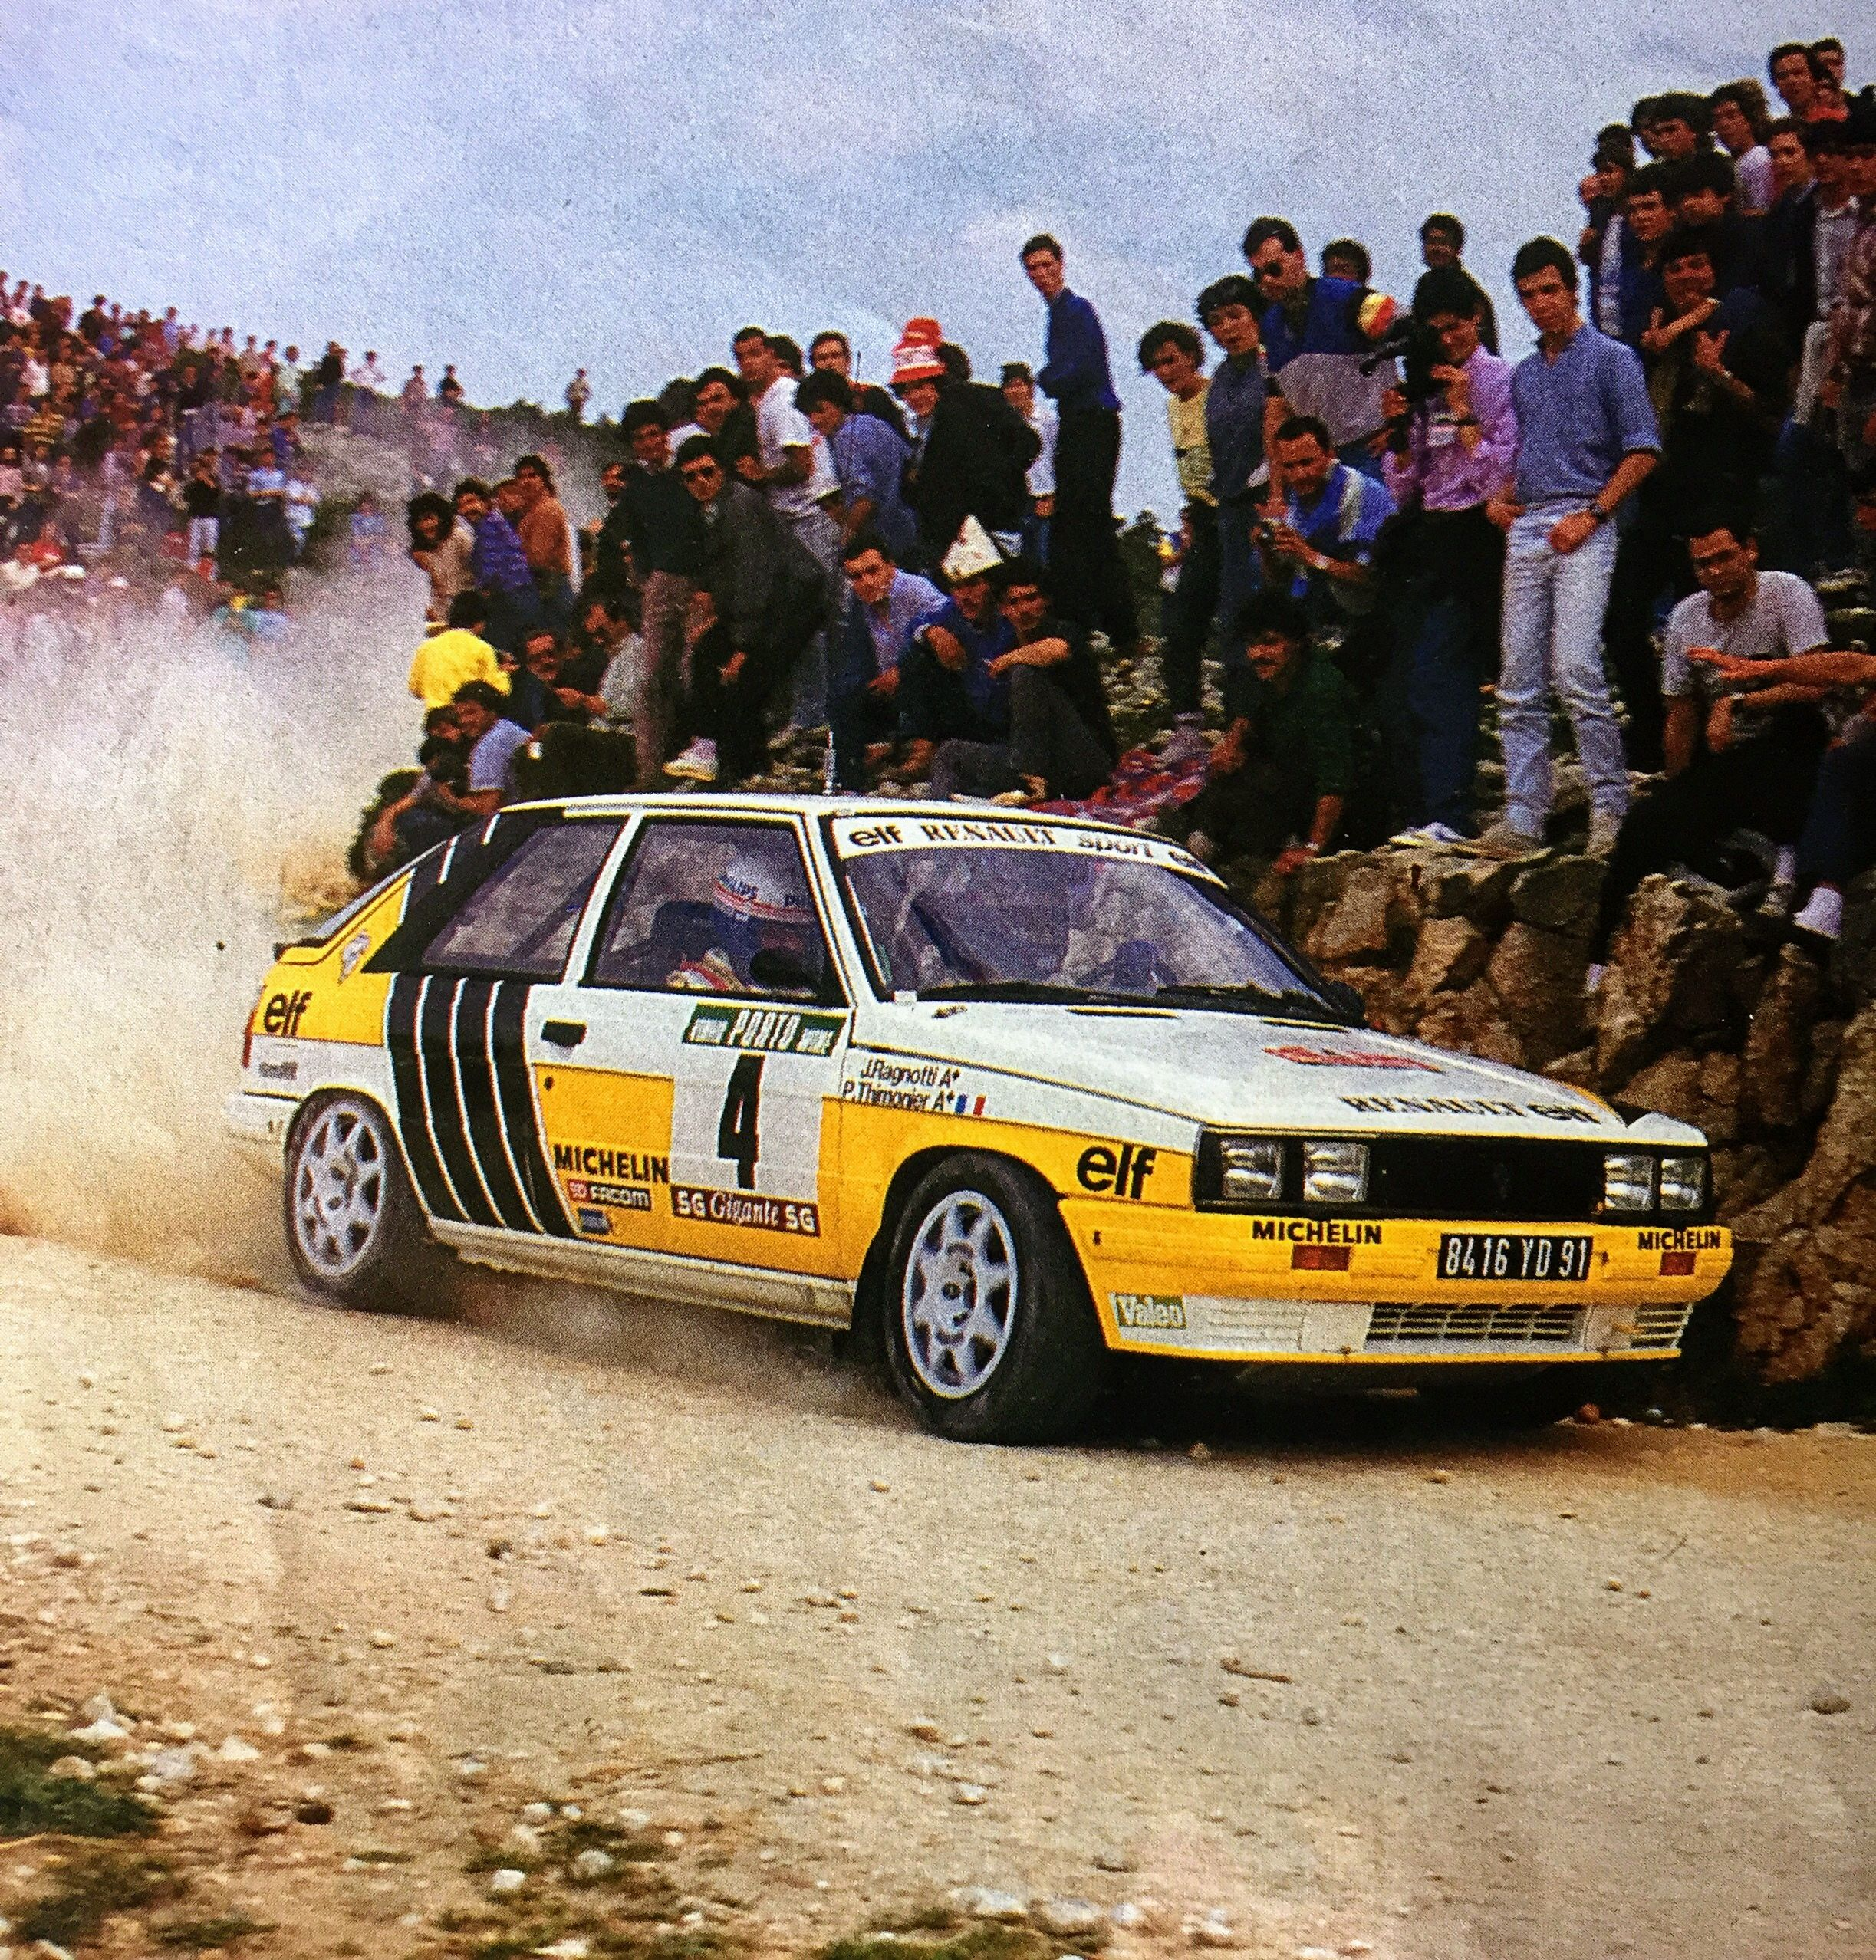 Renault Race Car: Renault 11 Turbo Gr.A Jean Ragnotti Pierre Thimonier Rally